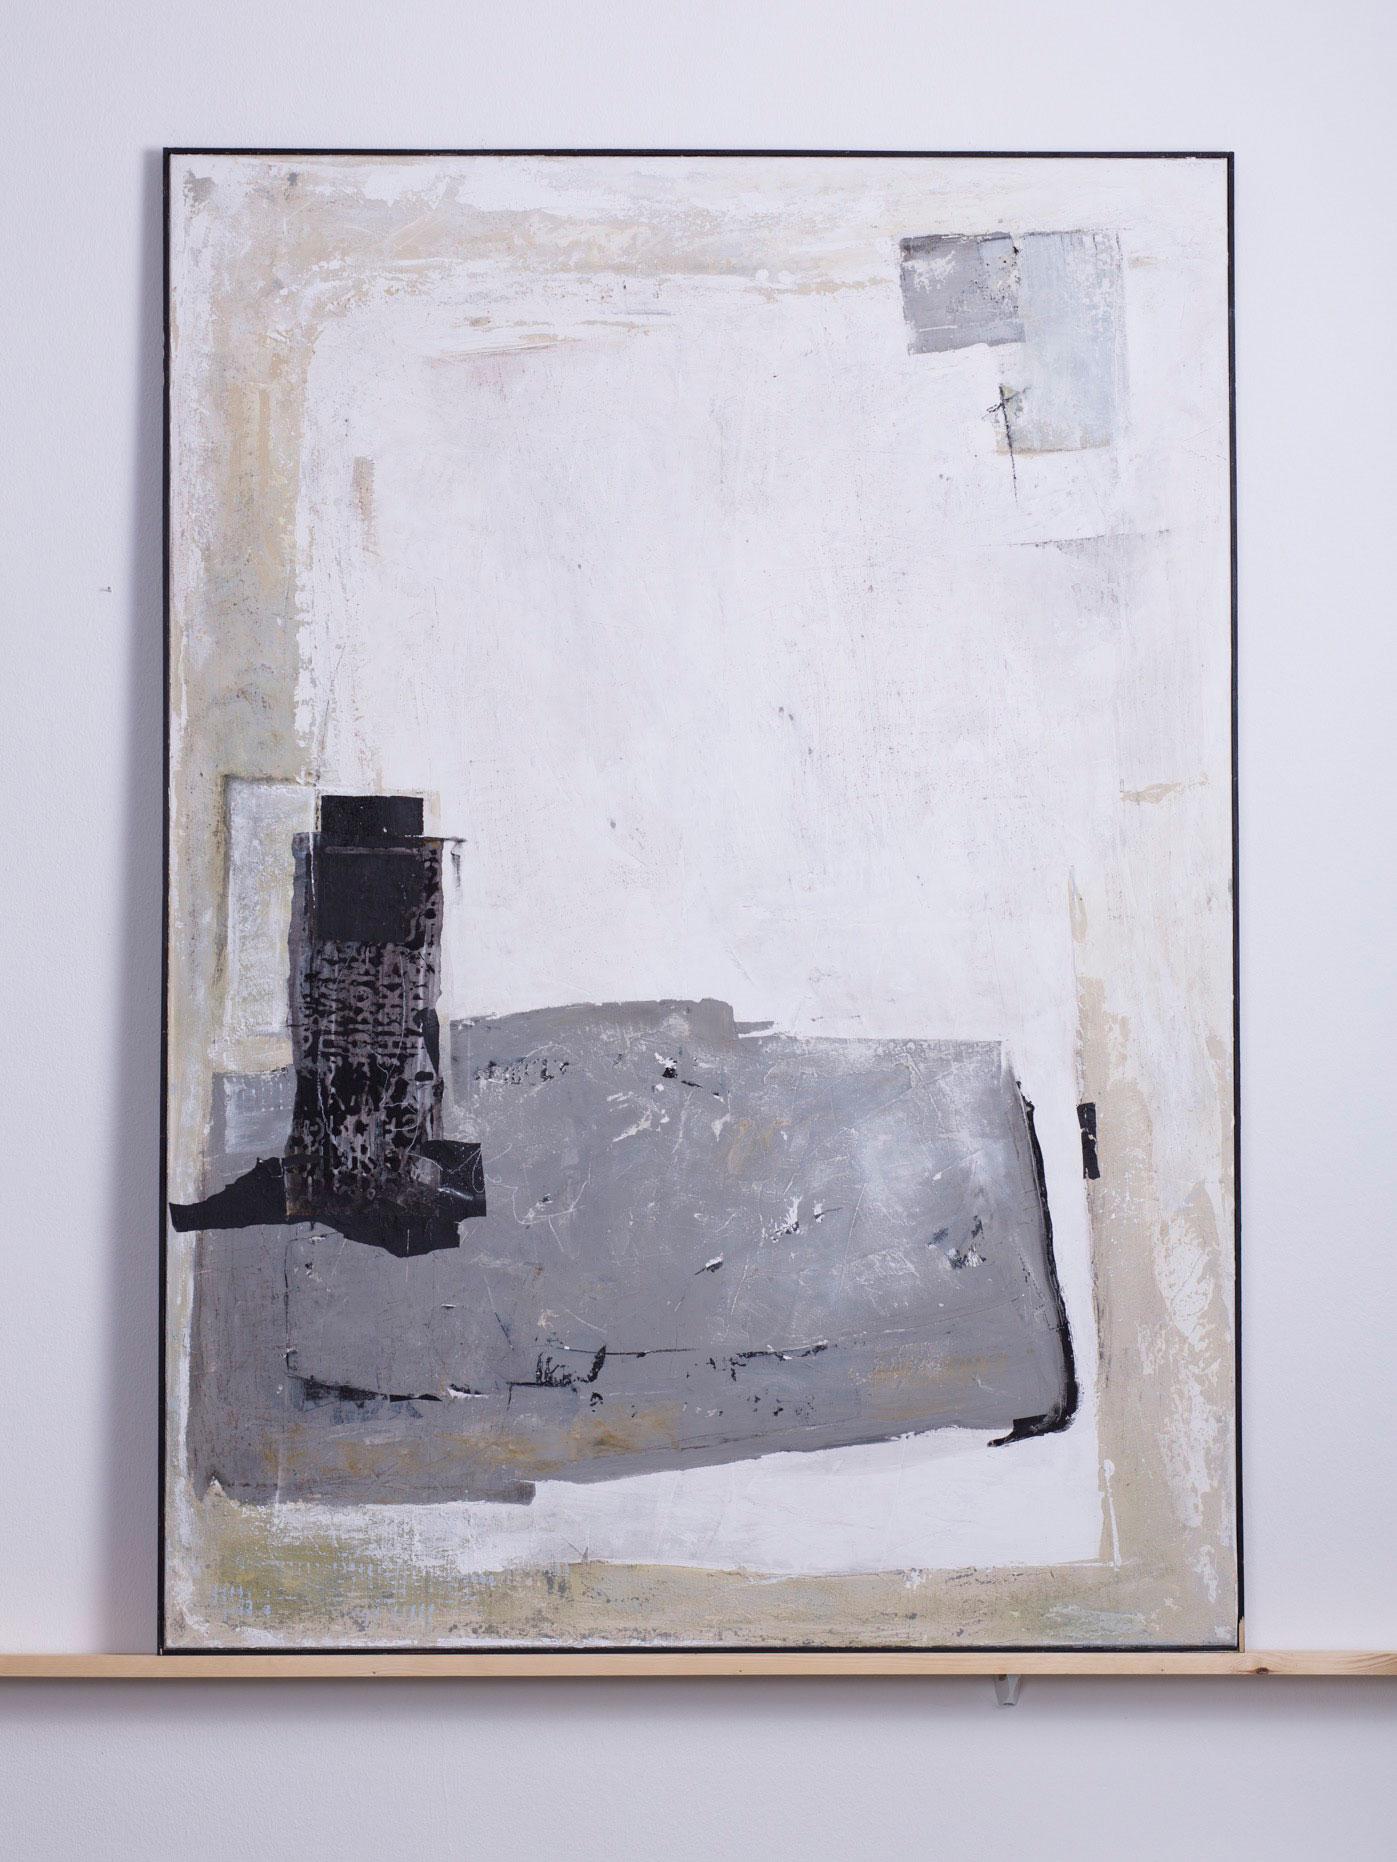 Kynegetikon, 2011 - 100x140 cm, <br>Acryl, Papier und Kohle auf Leinwand